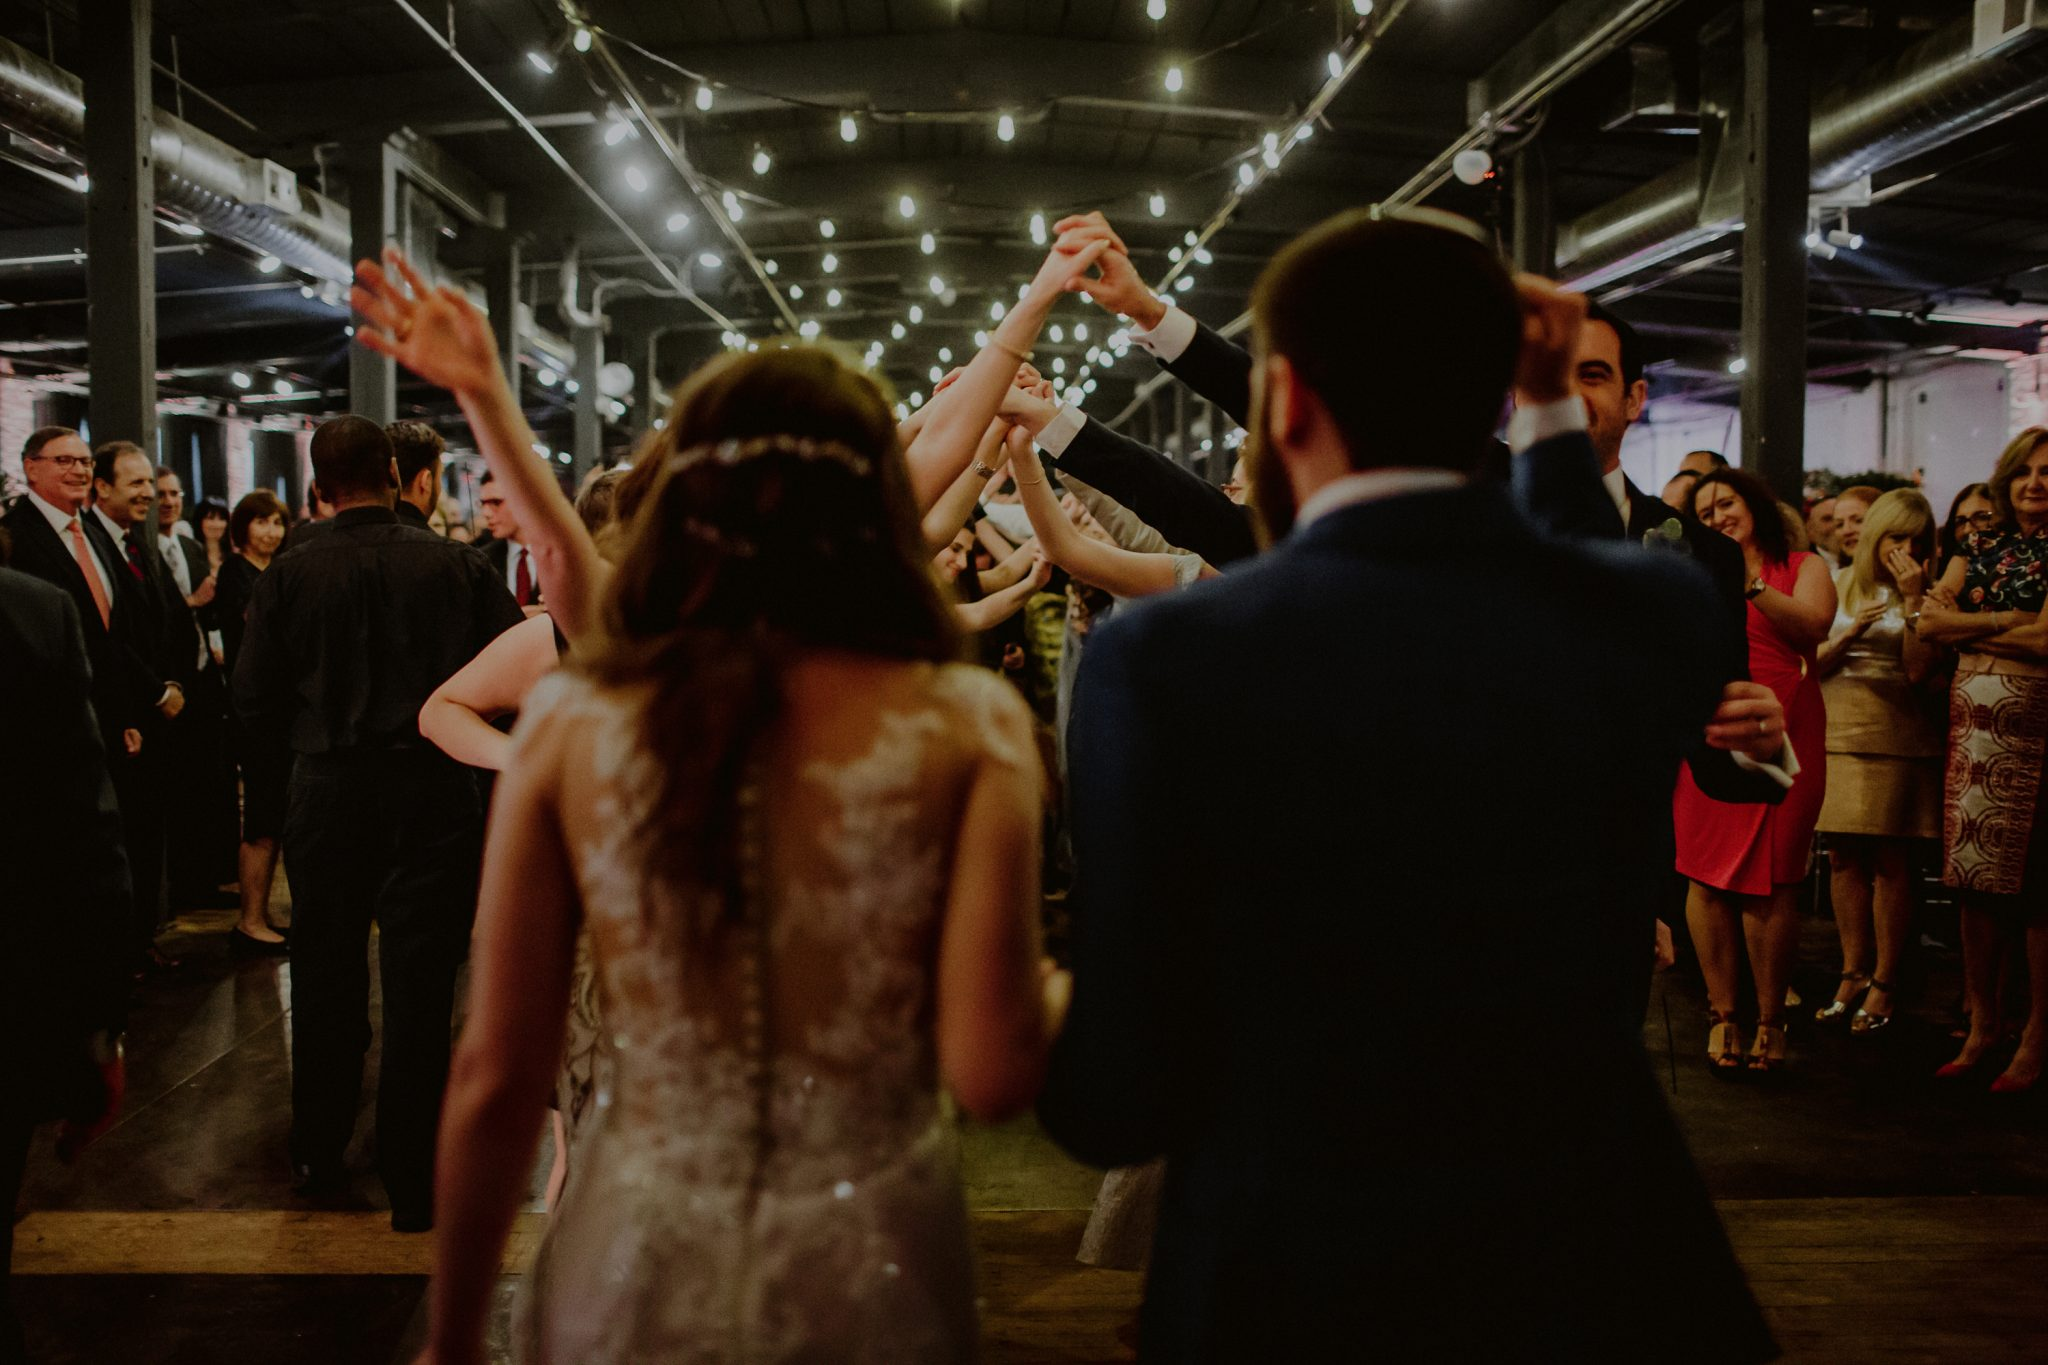 NJ Jewish wedding photographs